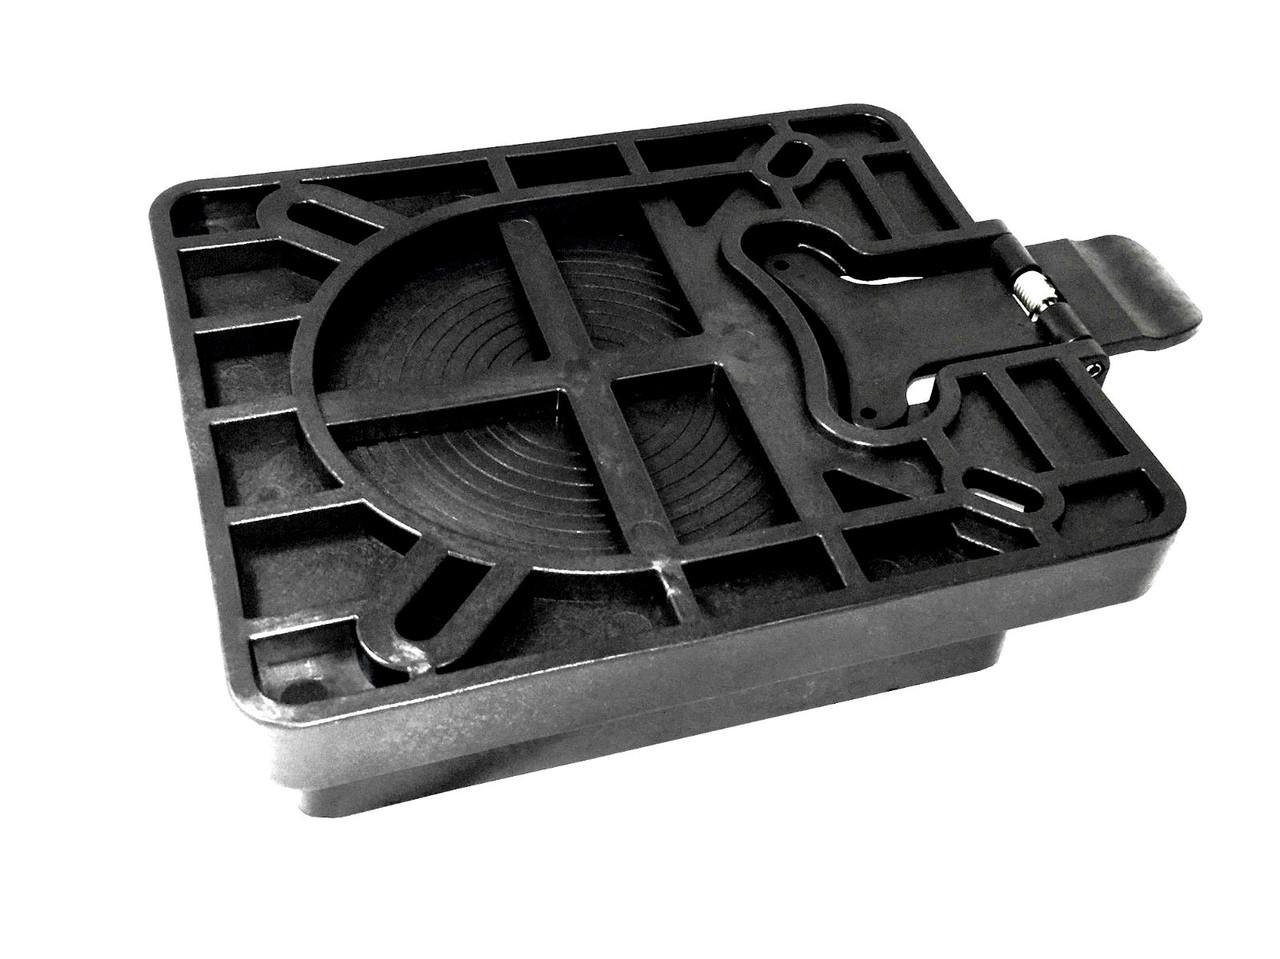 Поворотная пластина съемная с фиксатором, пластик С12567